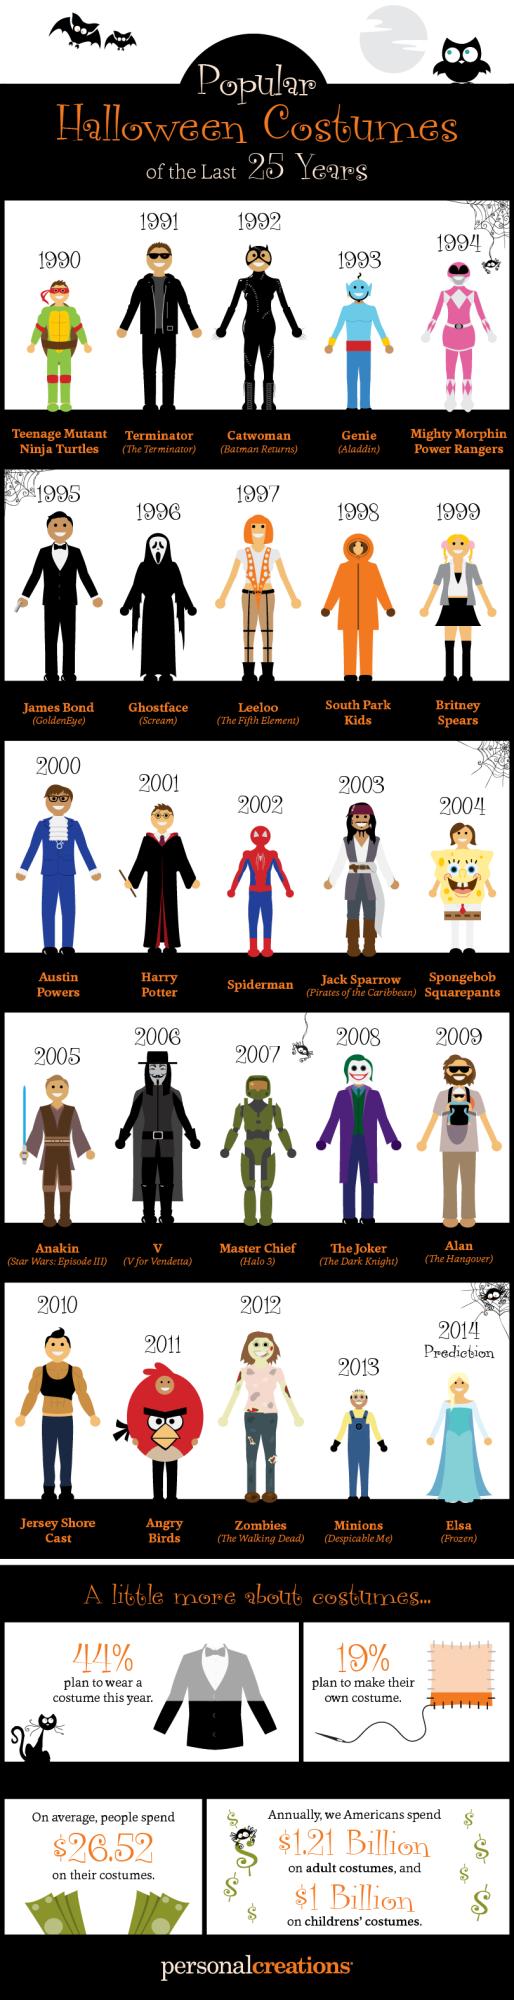 popular_halloween_costumes_25_years